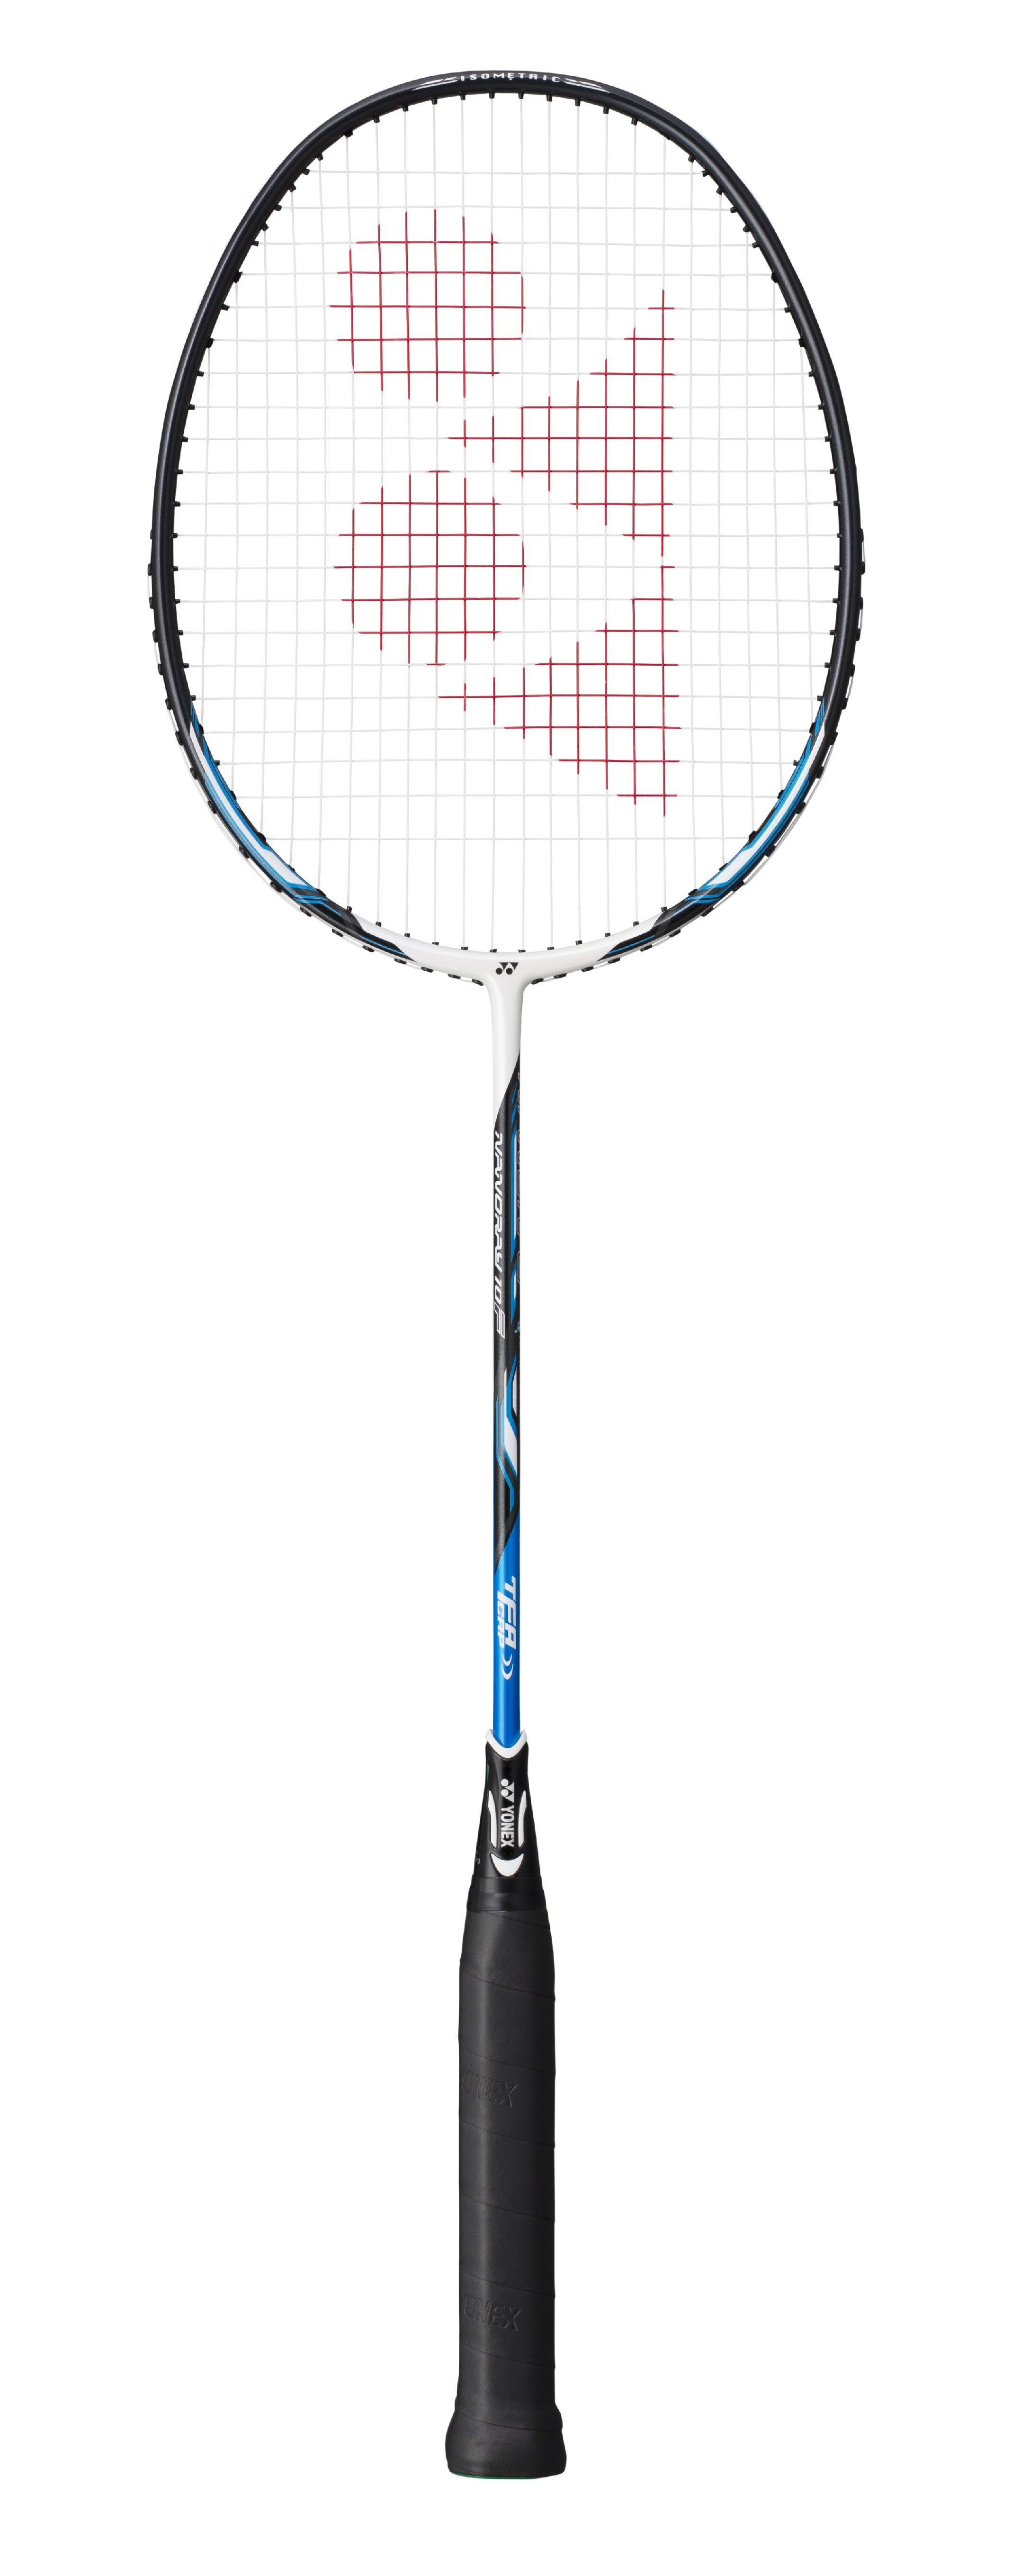 Yonex Nanoray 10 Preisvergleich - Badminton - Günstig ...